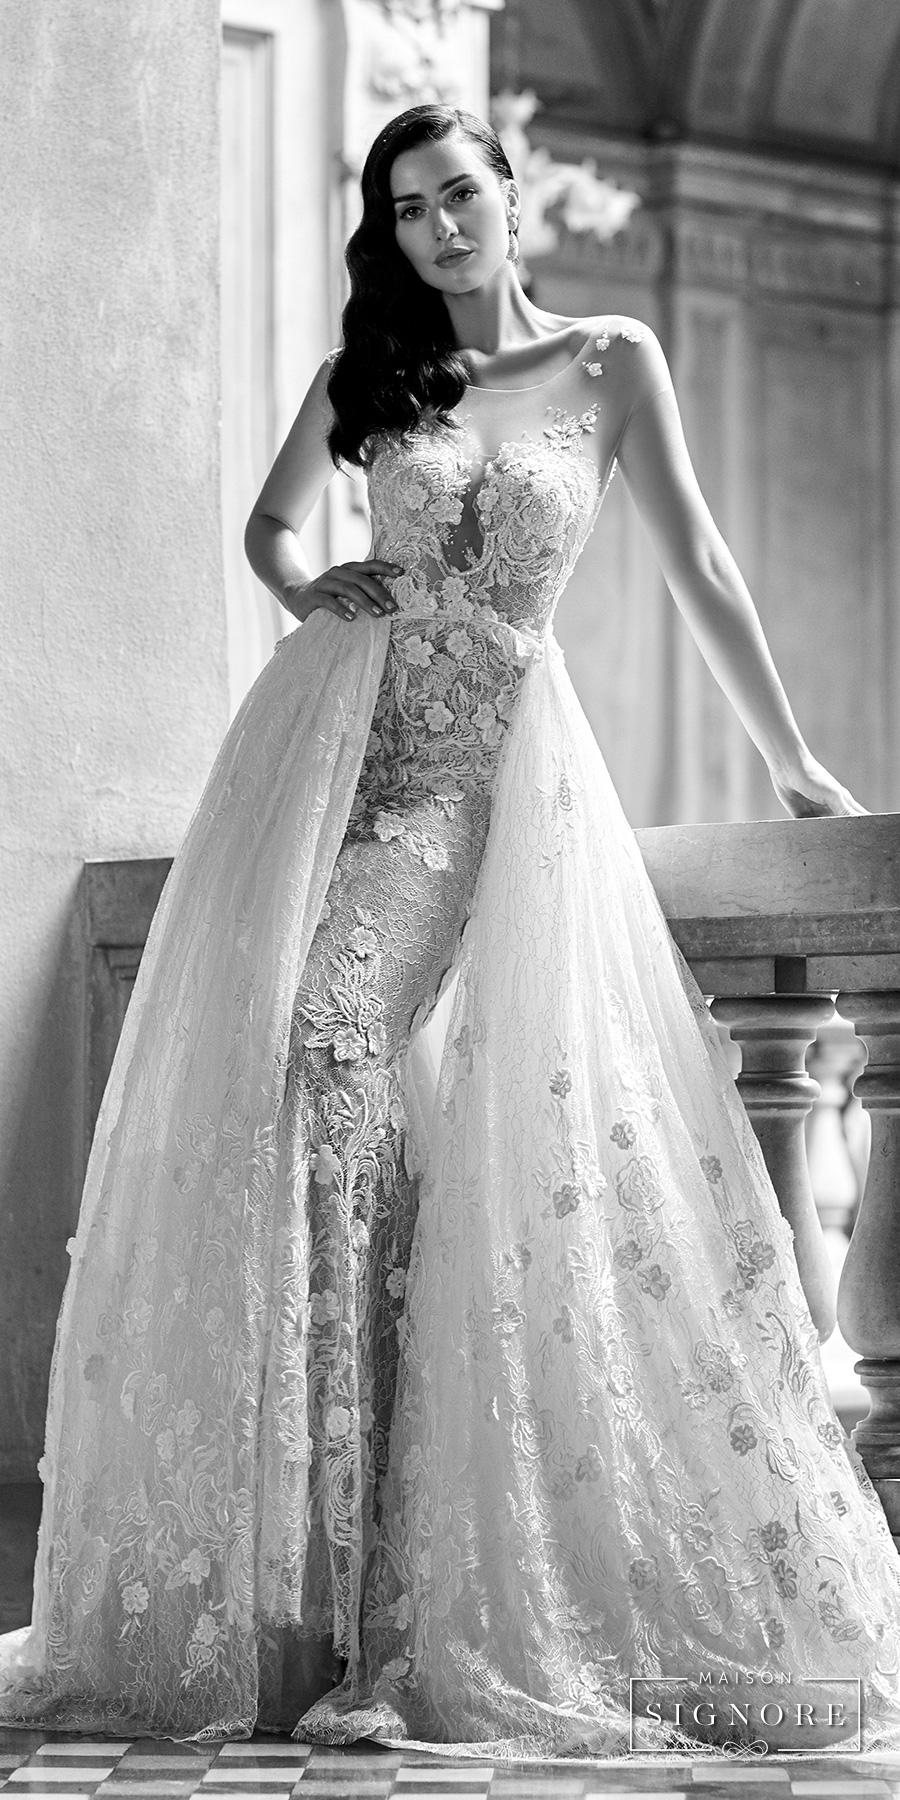 maison signore 2017 bridal sleeveless illusion jewel neck sweetheart neckline full embellishment elegant princess fit and flare wedding dress a  line overskirt open v back chapel train (eden) mv